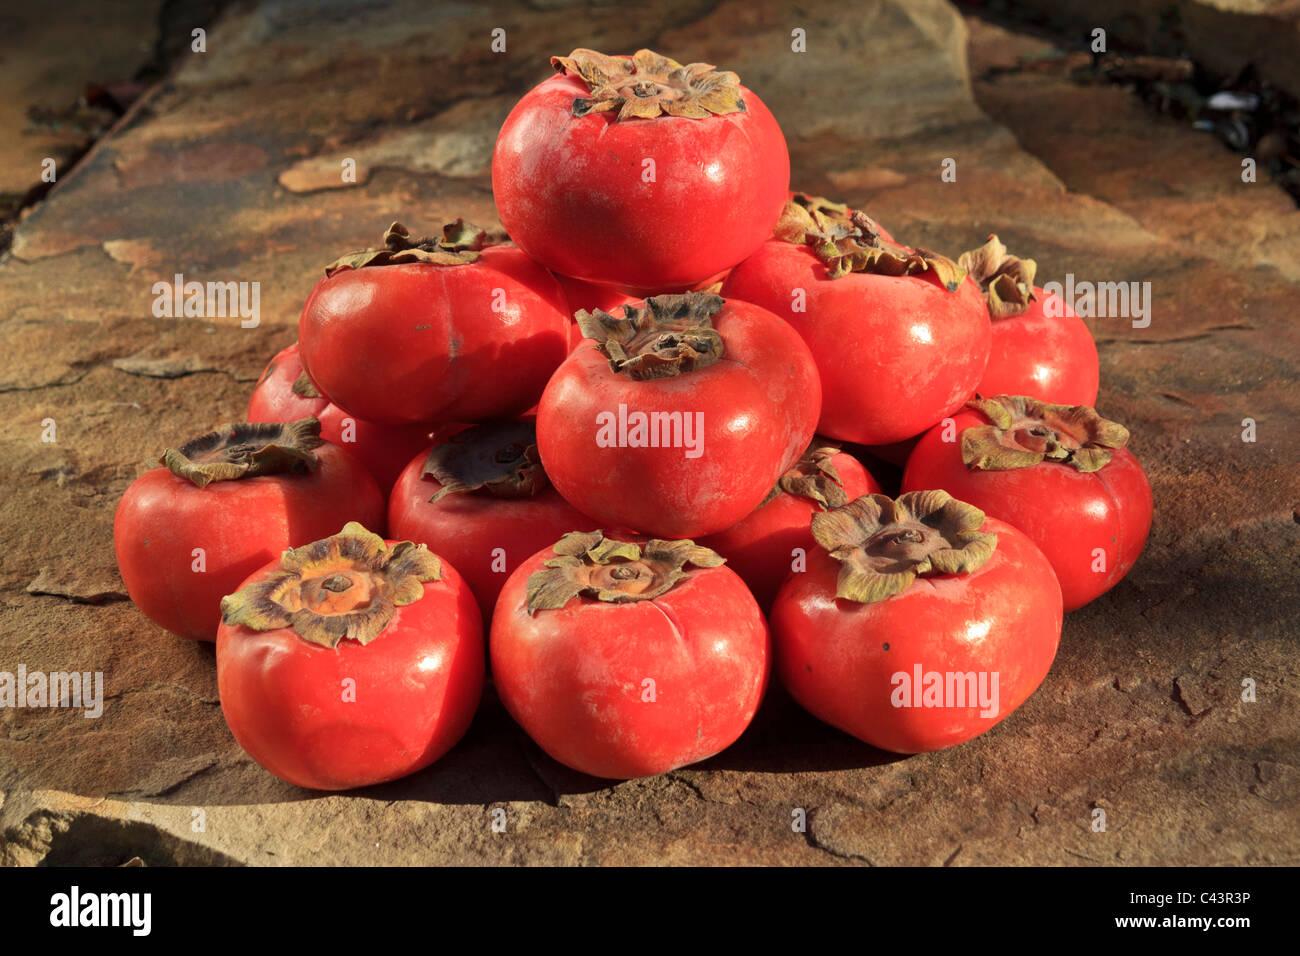 Diospyros, Ebenaceae, edible fruit, fruit, fruits, Fuyu, health, Japanese persimmons, kaki, persimmons - Stock Image